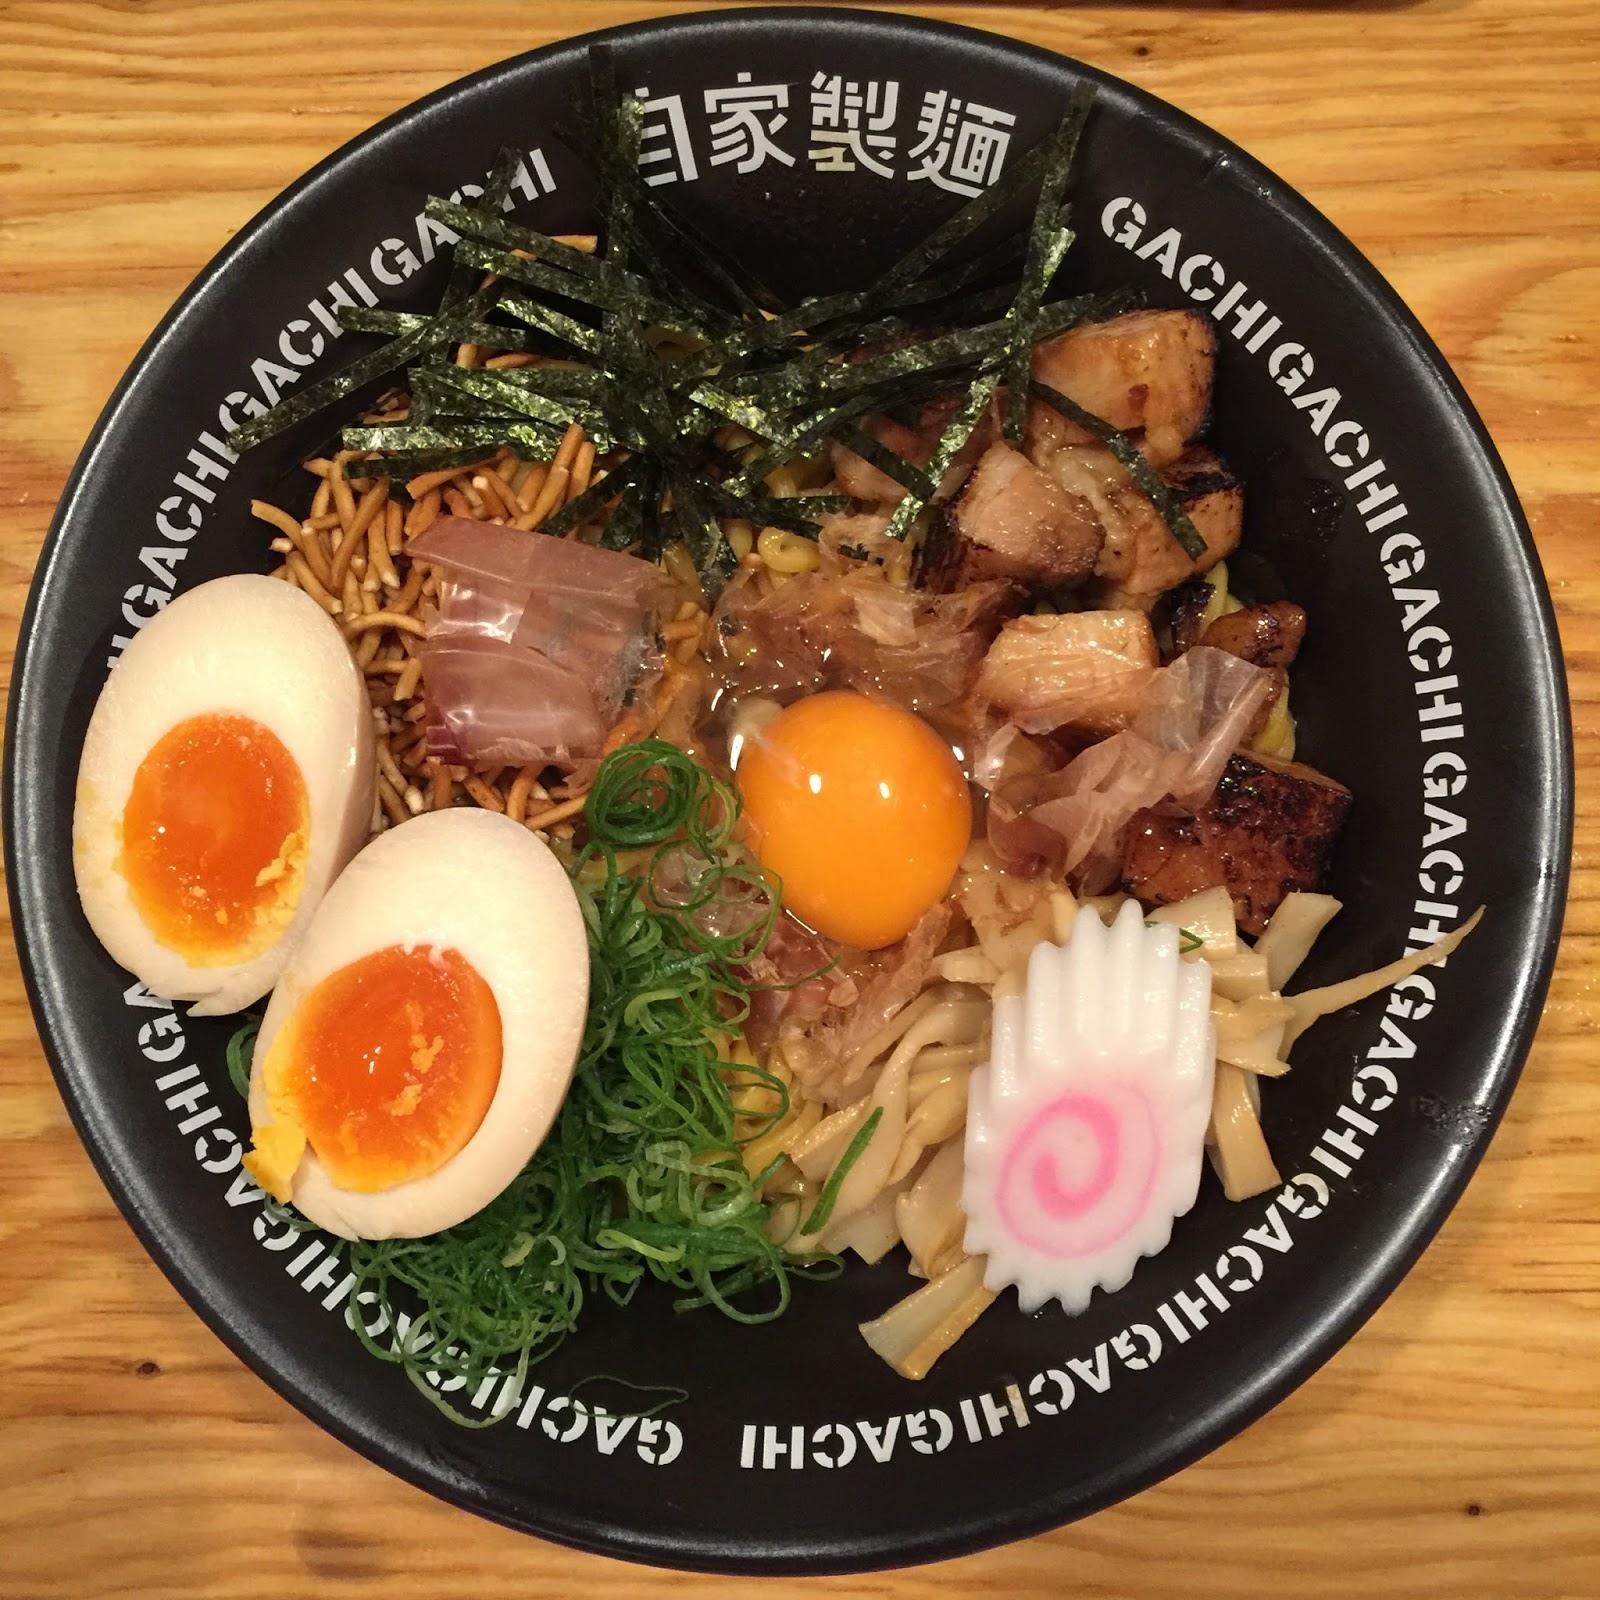 Singapore Japan Food Blog : Dairy and Cream: Menya Gachi ...